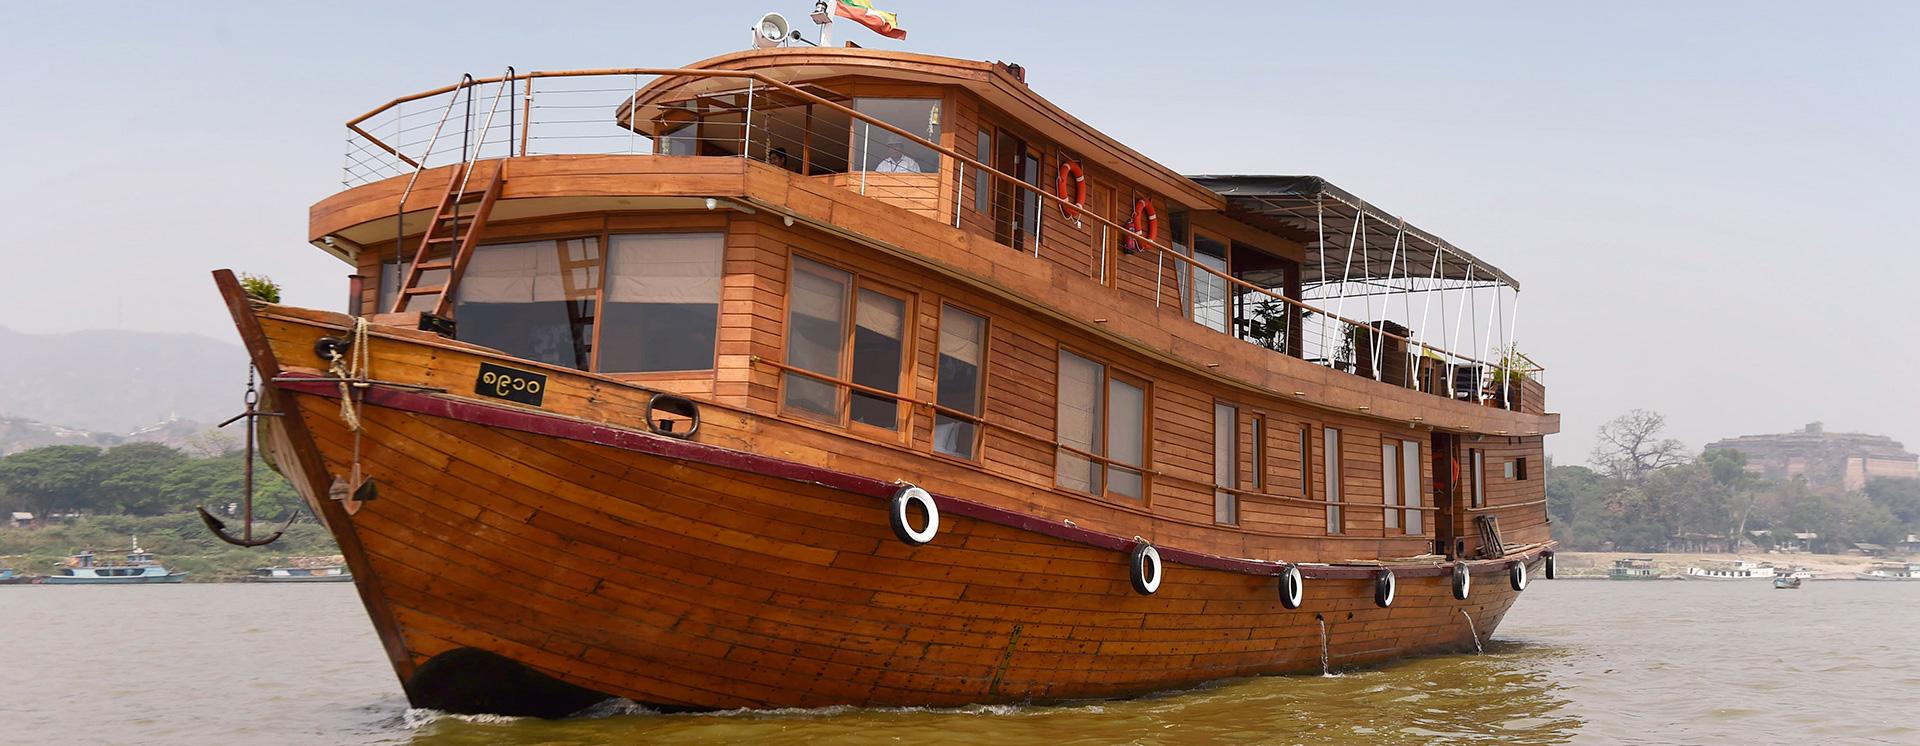 Amata Cruises